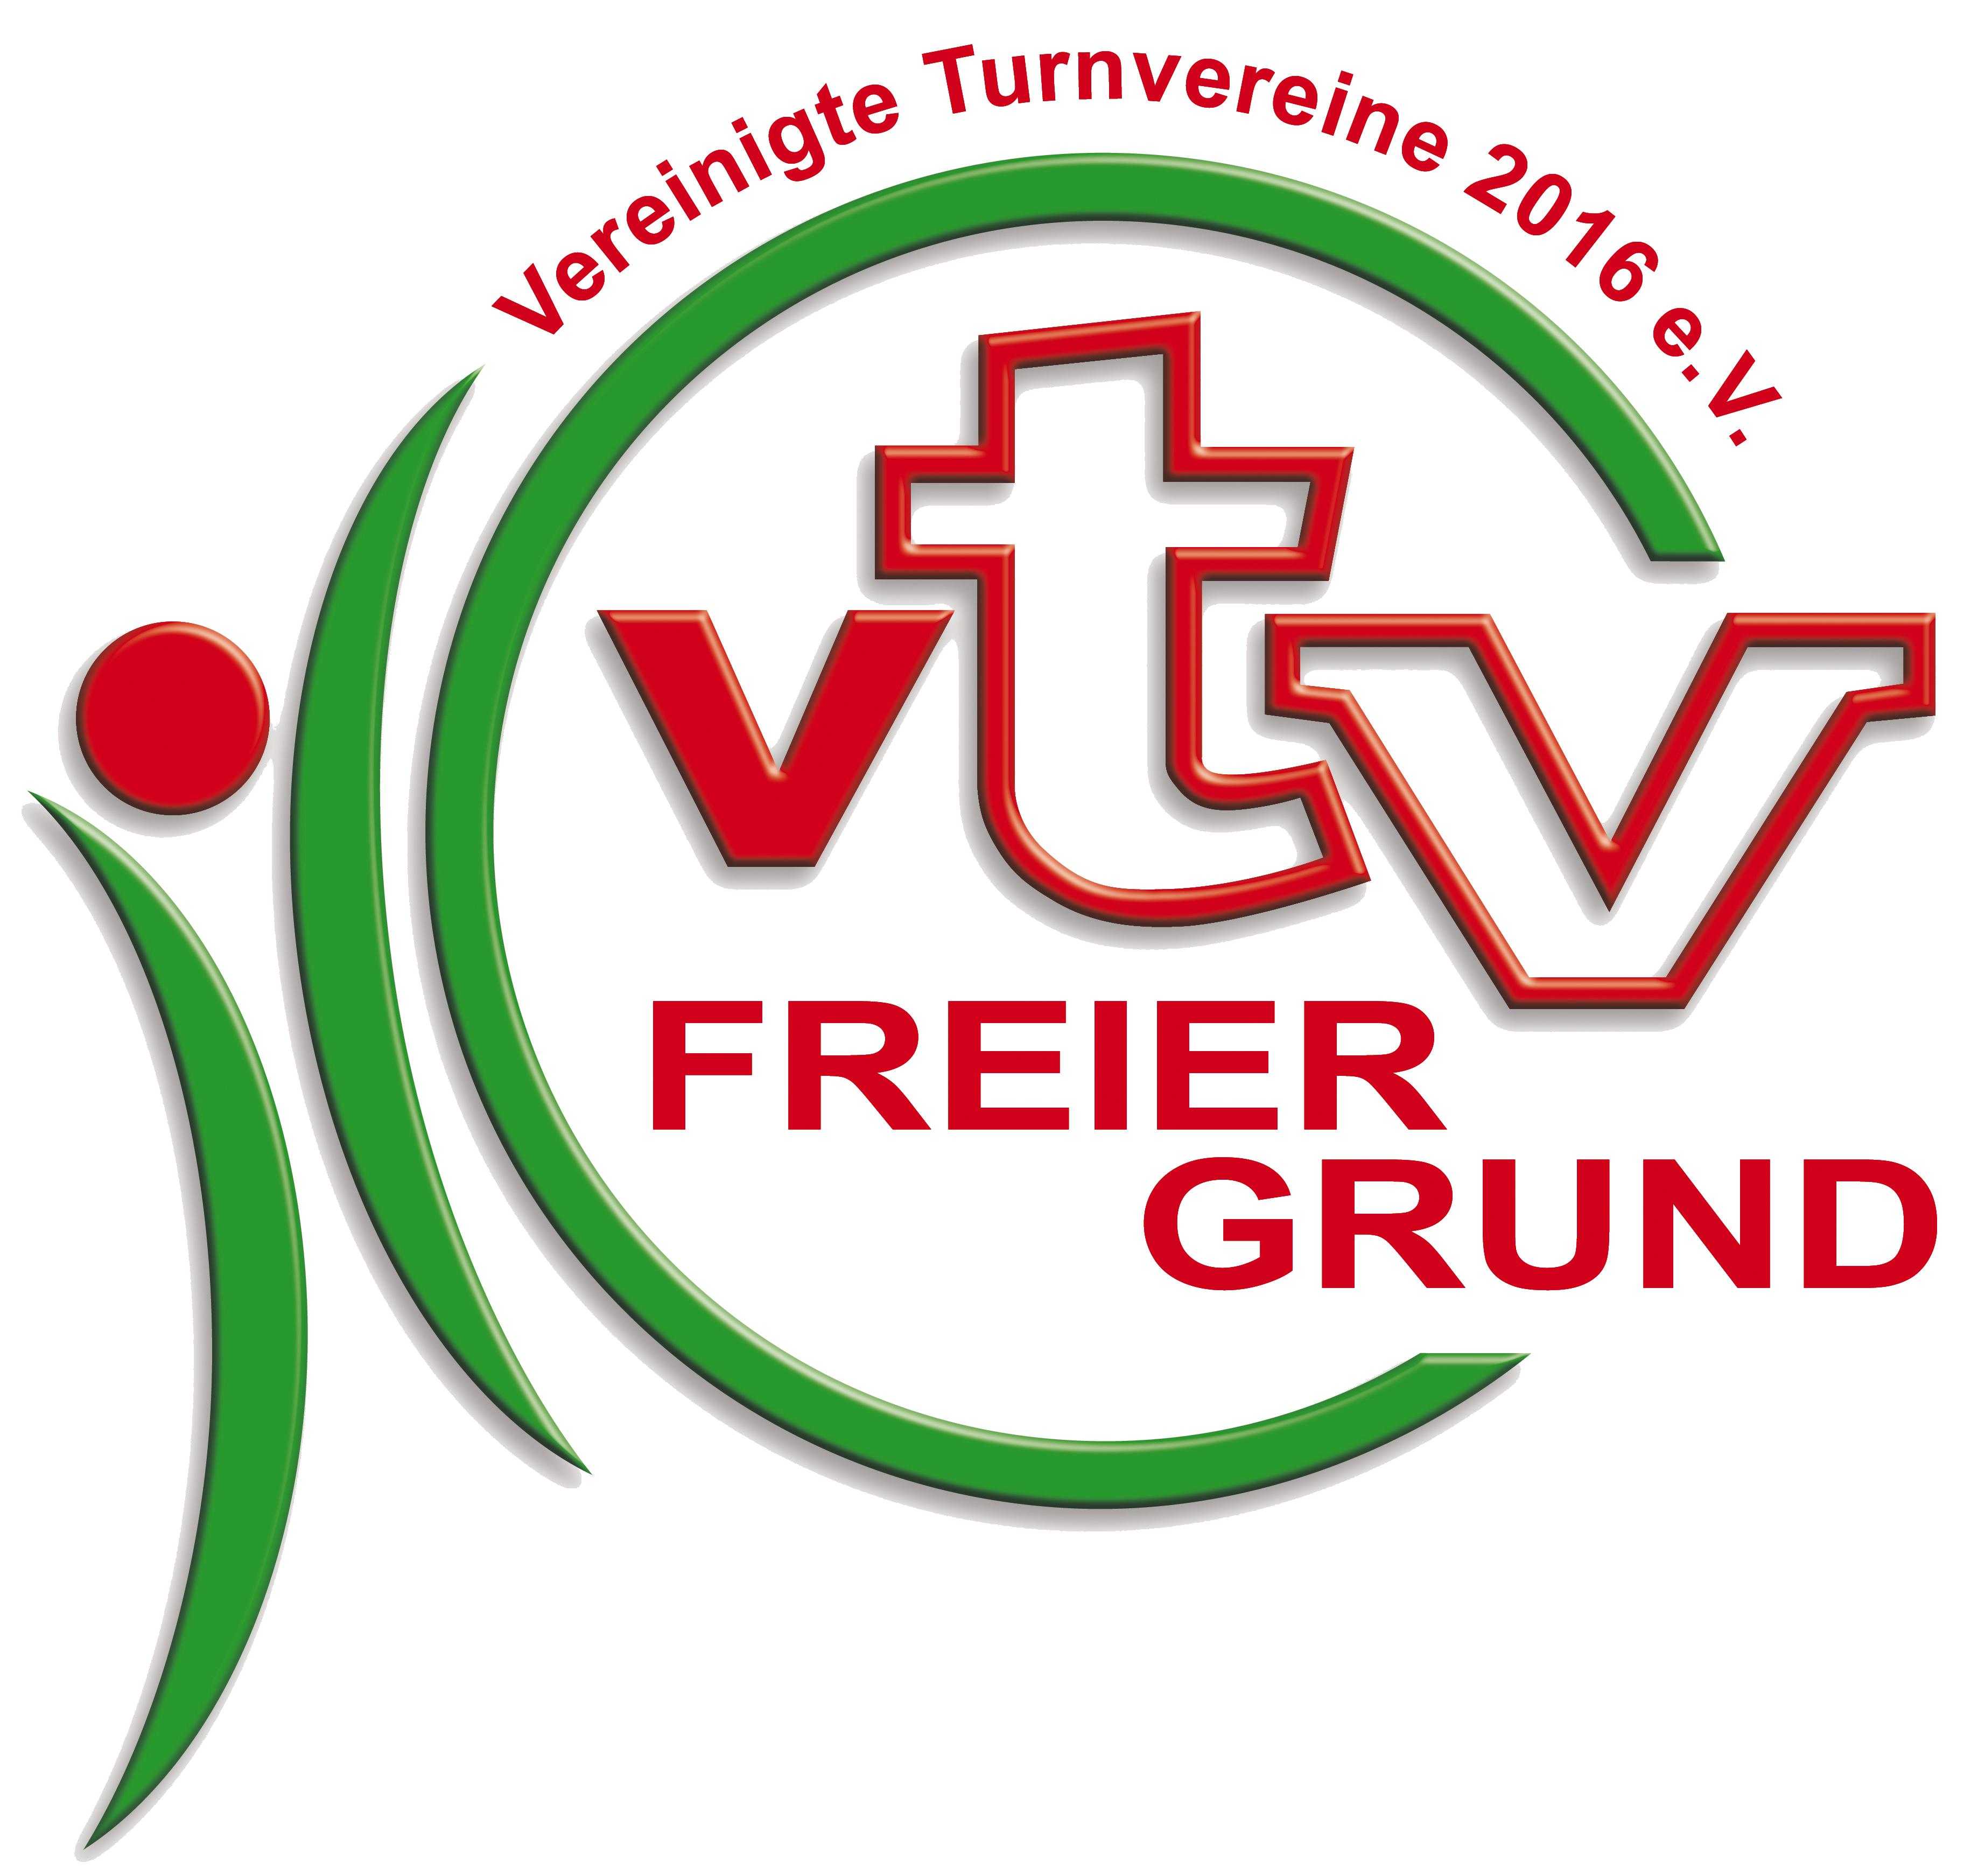 VTV Freier Grund 2016 e.V.